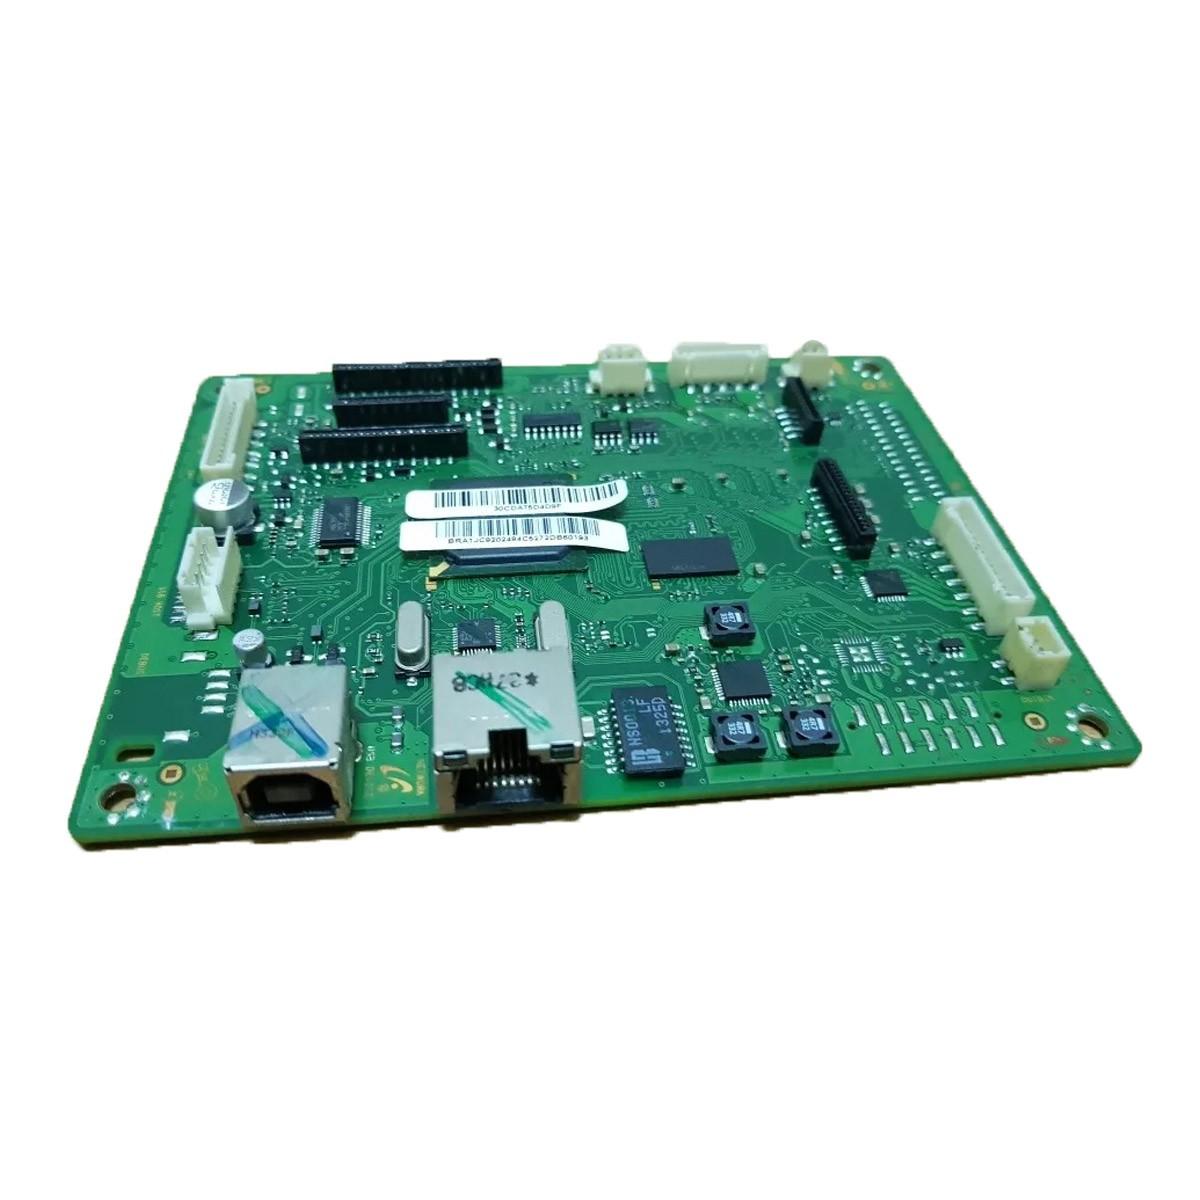 Placa Lógica Multifuncional Samsung Clx-3305w (ml78) PN:Jc41-00763a - Retirado k